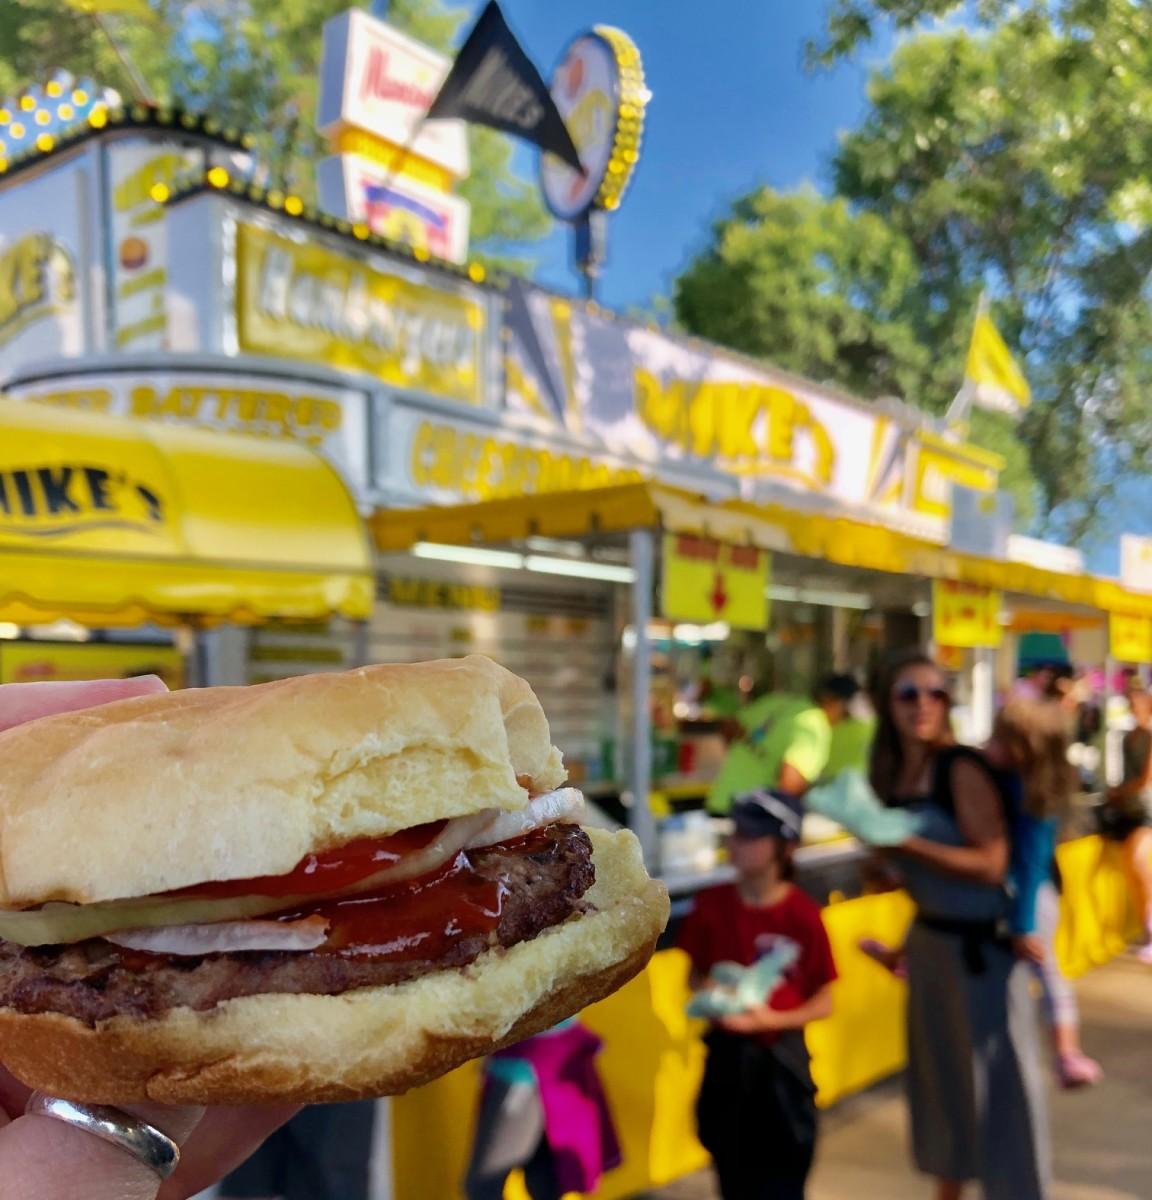 Mike Hamburgers State Fair